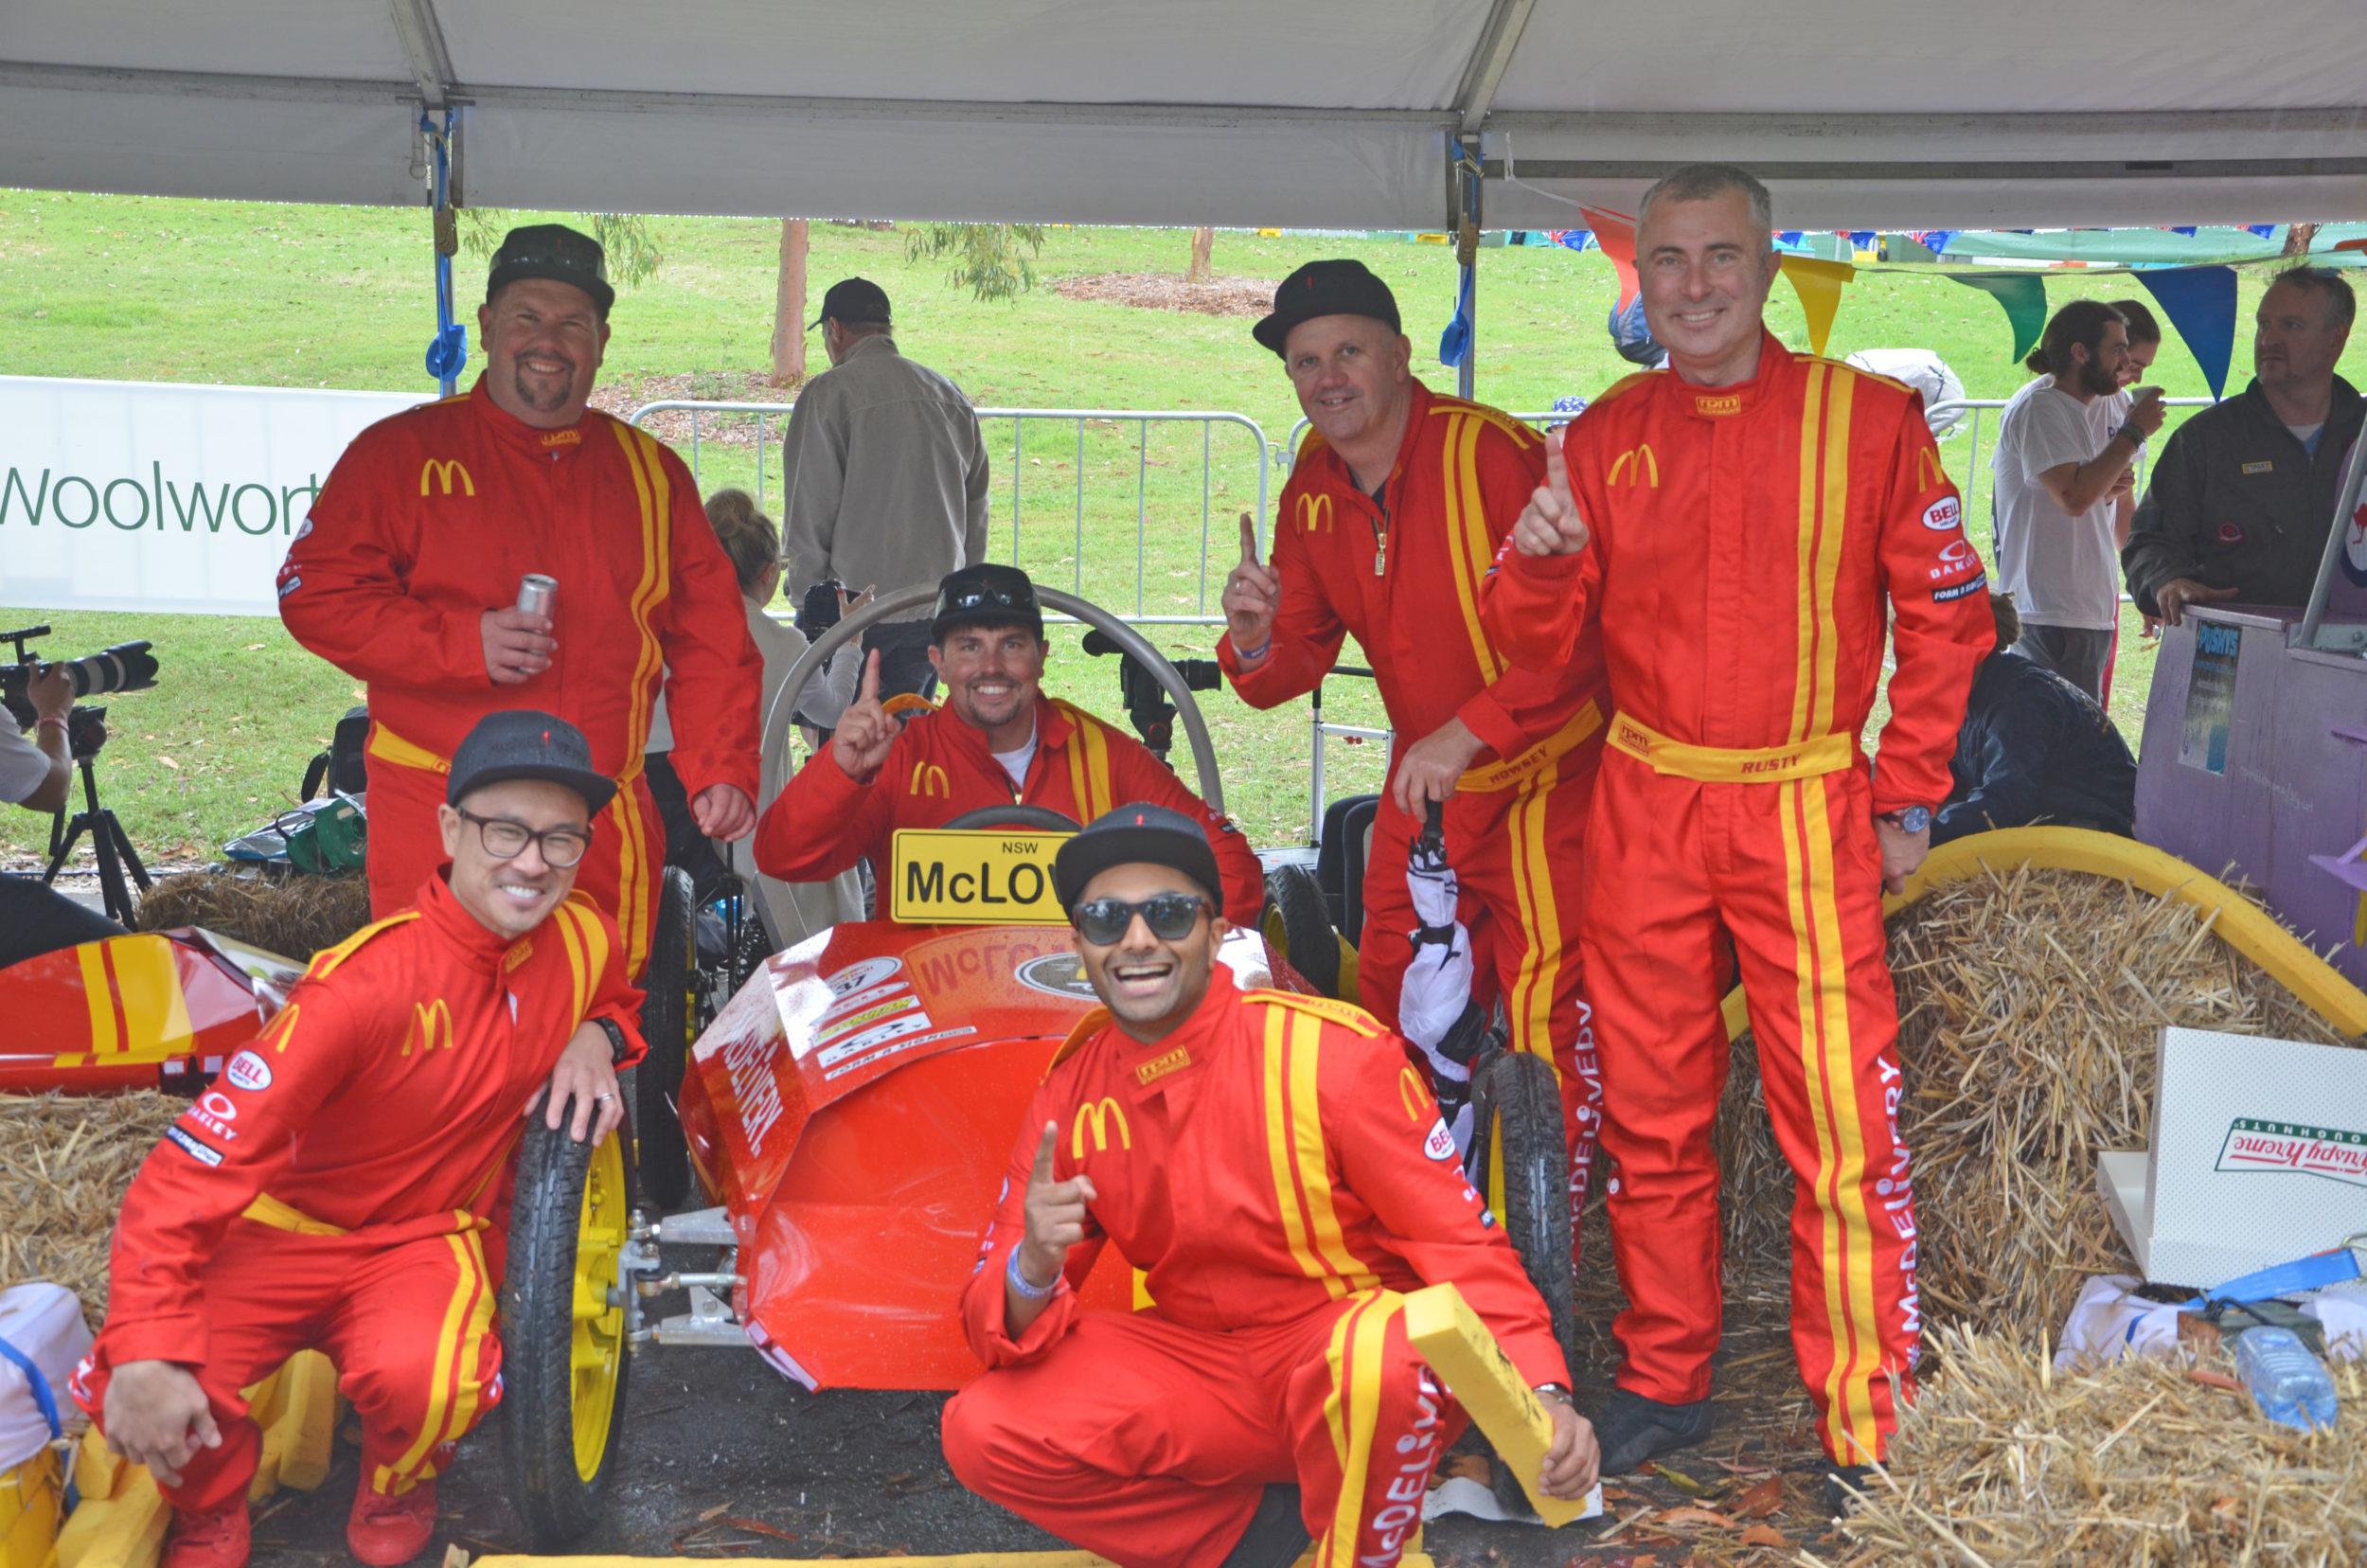 mcdonalds race car team